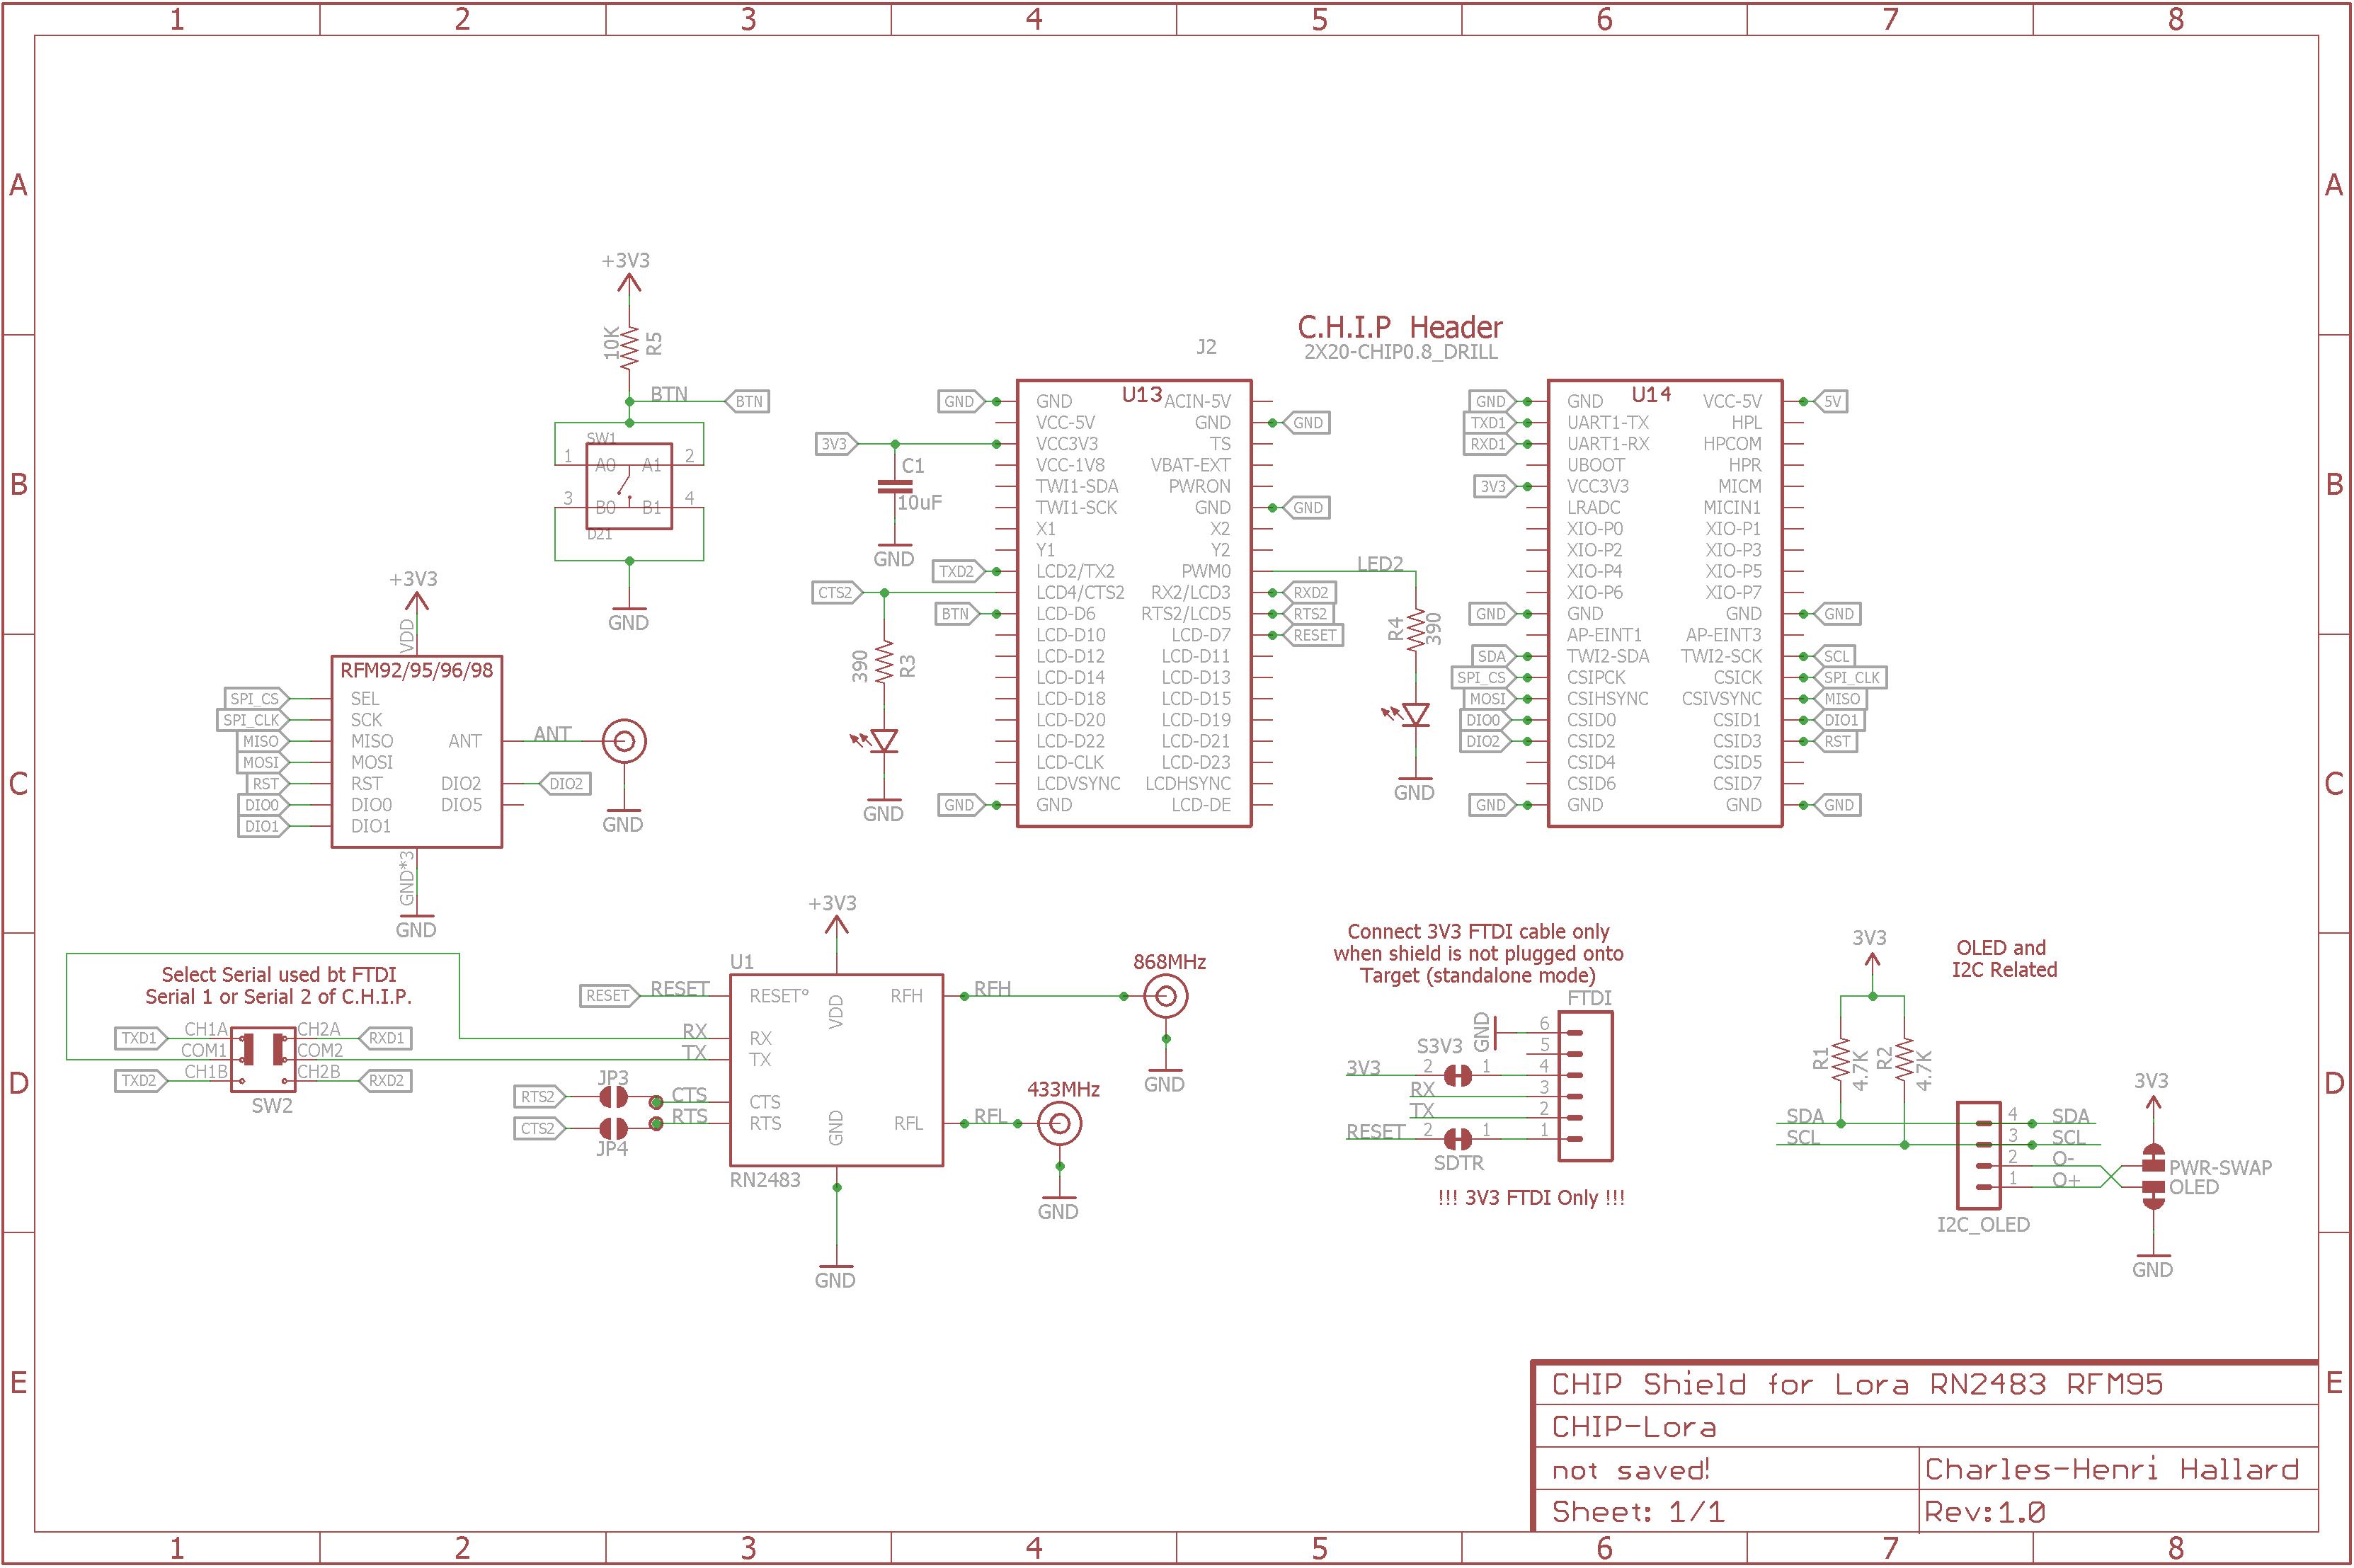 Github Hallard Lorachip Chip Computer Rn2483 Or Rfm95 Lora Shield Assembled Board From Schematic 1